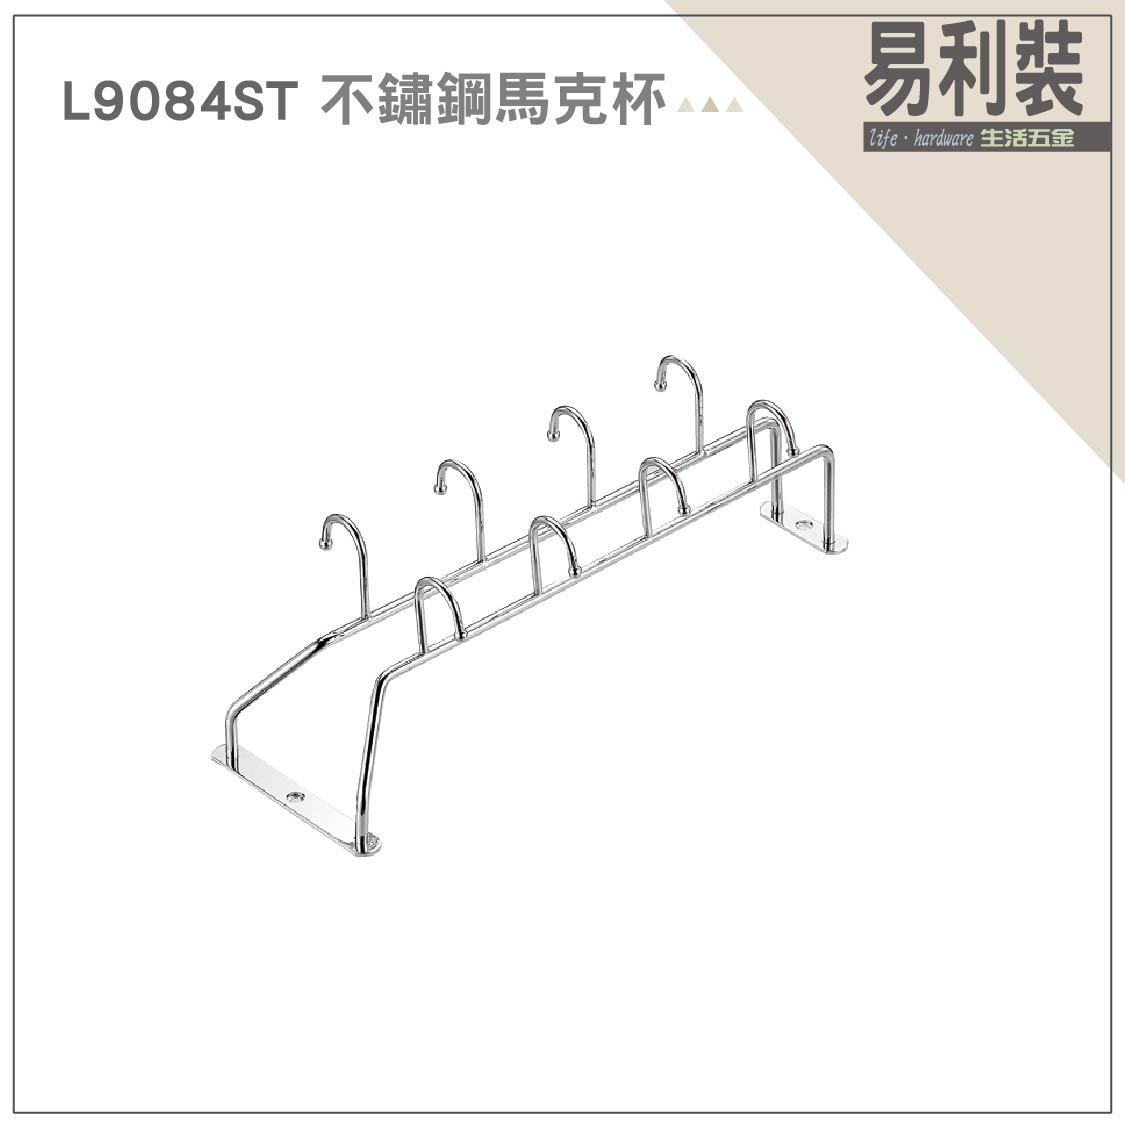 【 EASYCAN  】L9084 不鏽鋼馬克杯架 易利裝生活五金 餐廳 廚房 小資族 辦公家具 系統家具 0